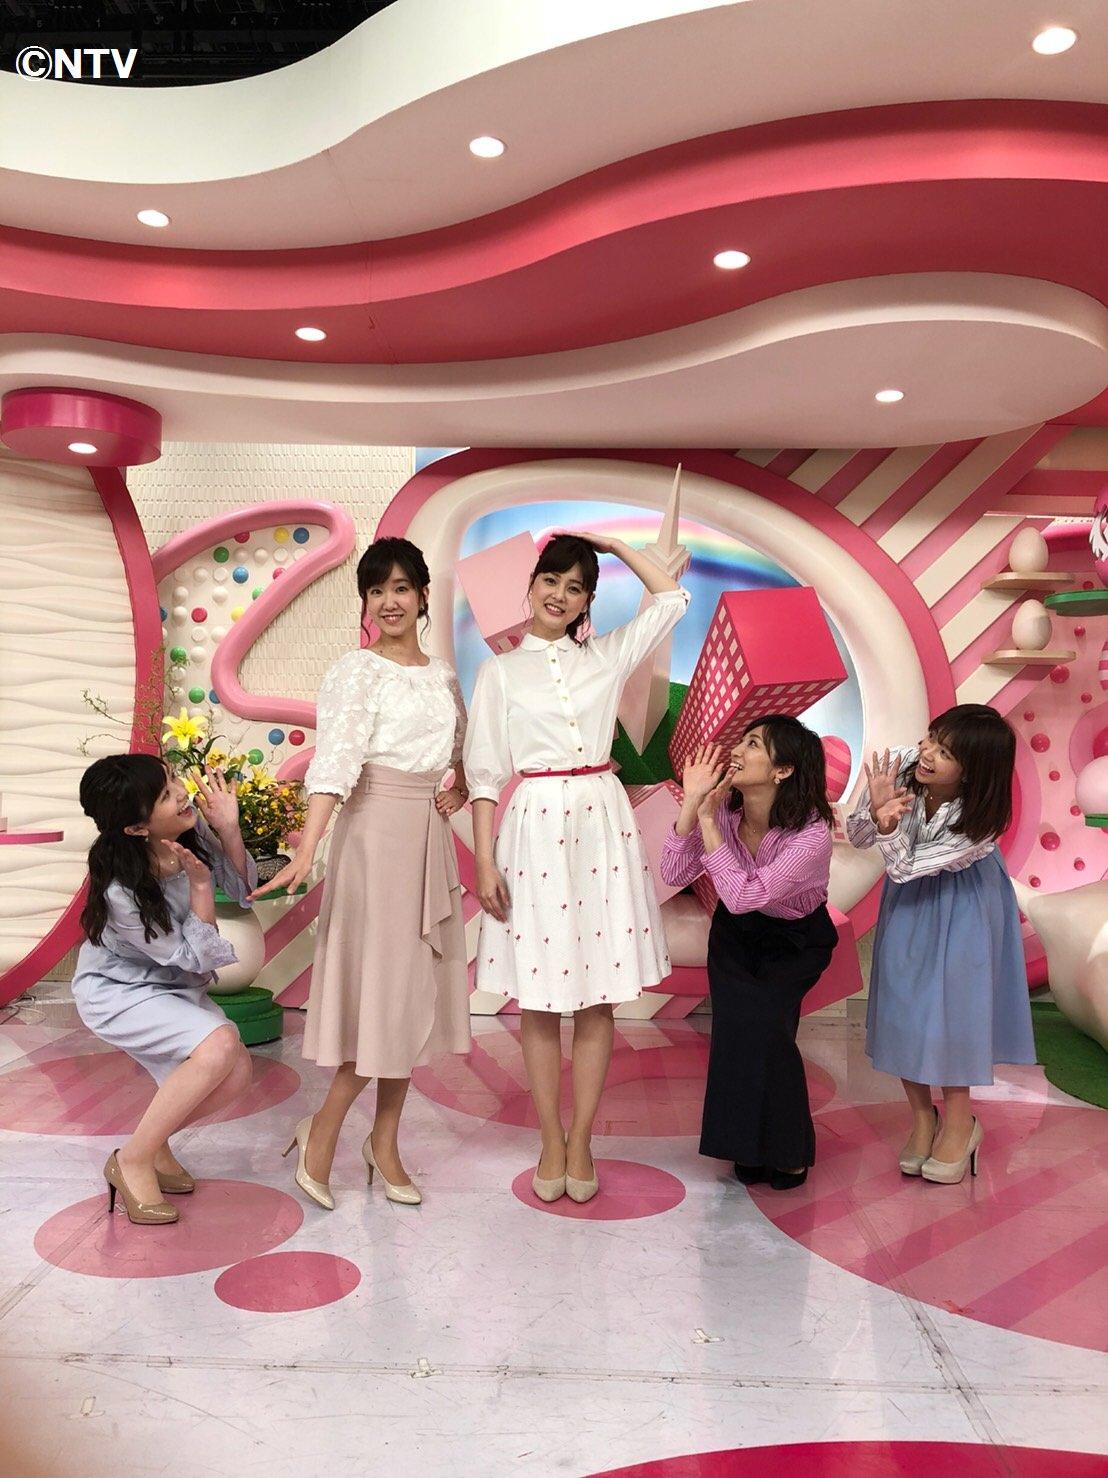 oha 4 news live 動画